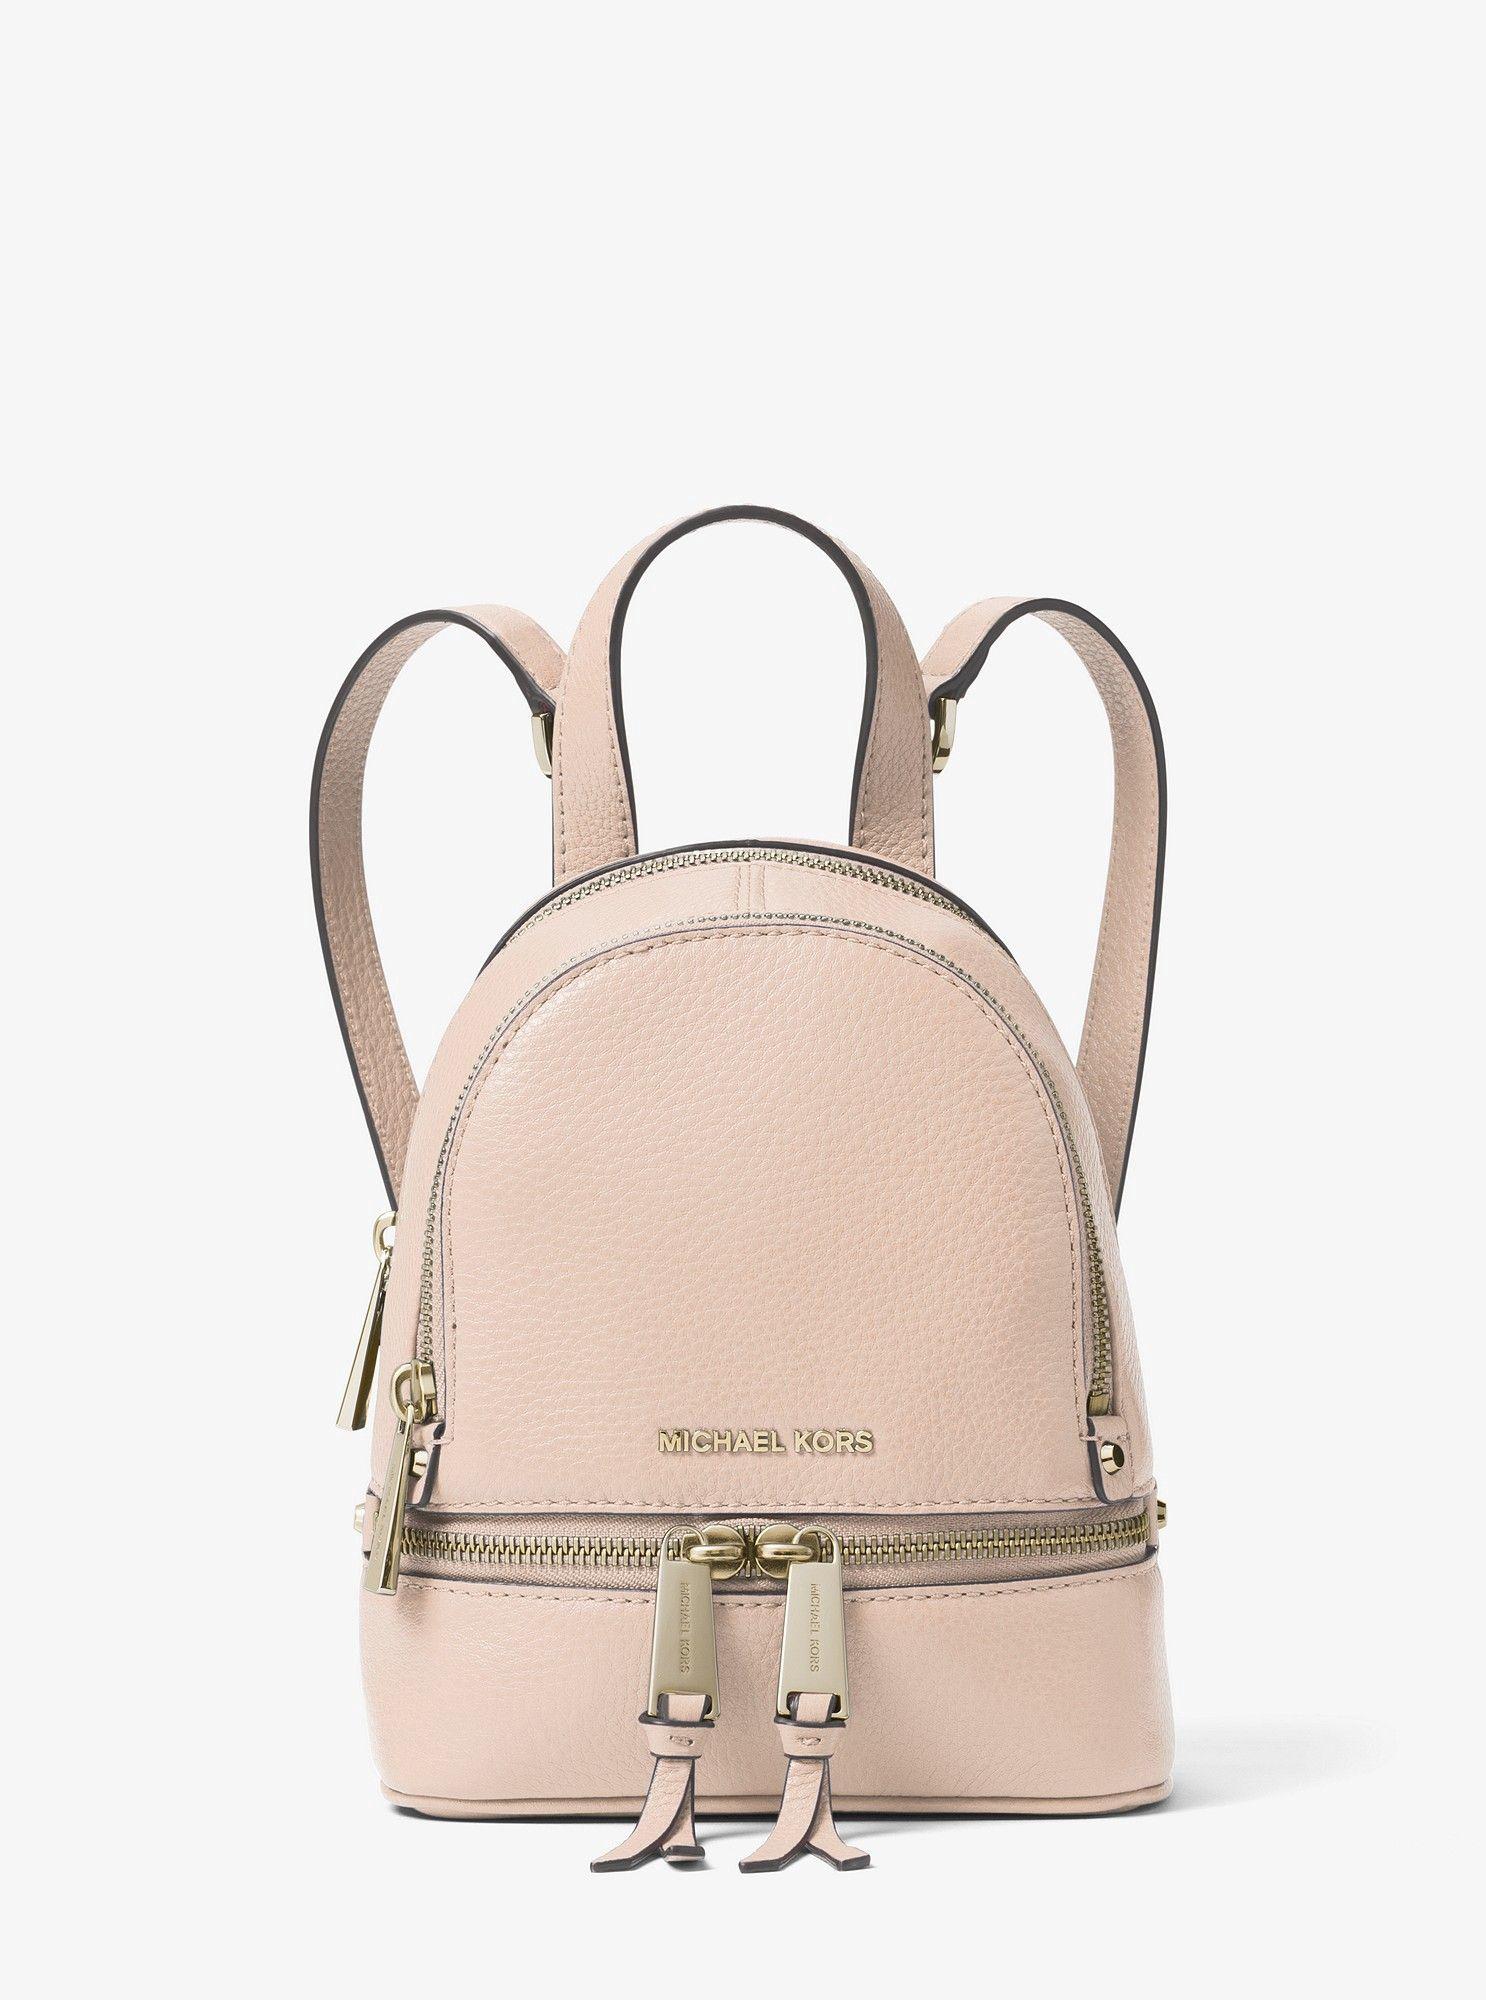 3f0bfc16f Michael Kors Rhea Mini Leather Backpack - Oxblood in 2019 | Products ...